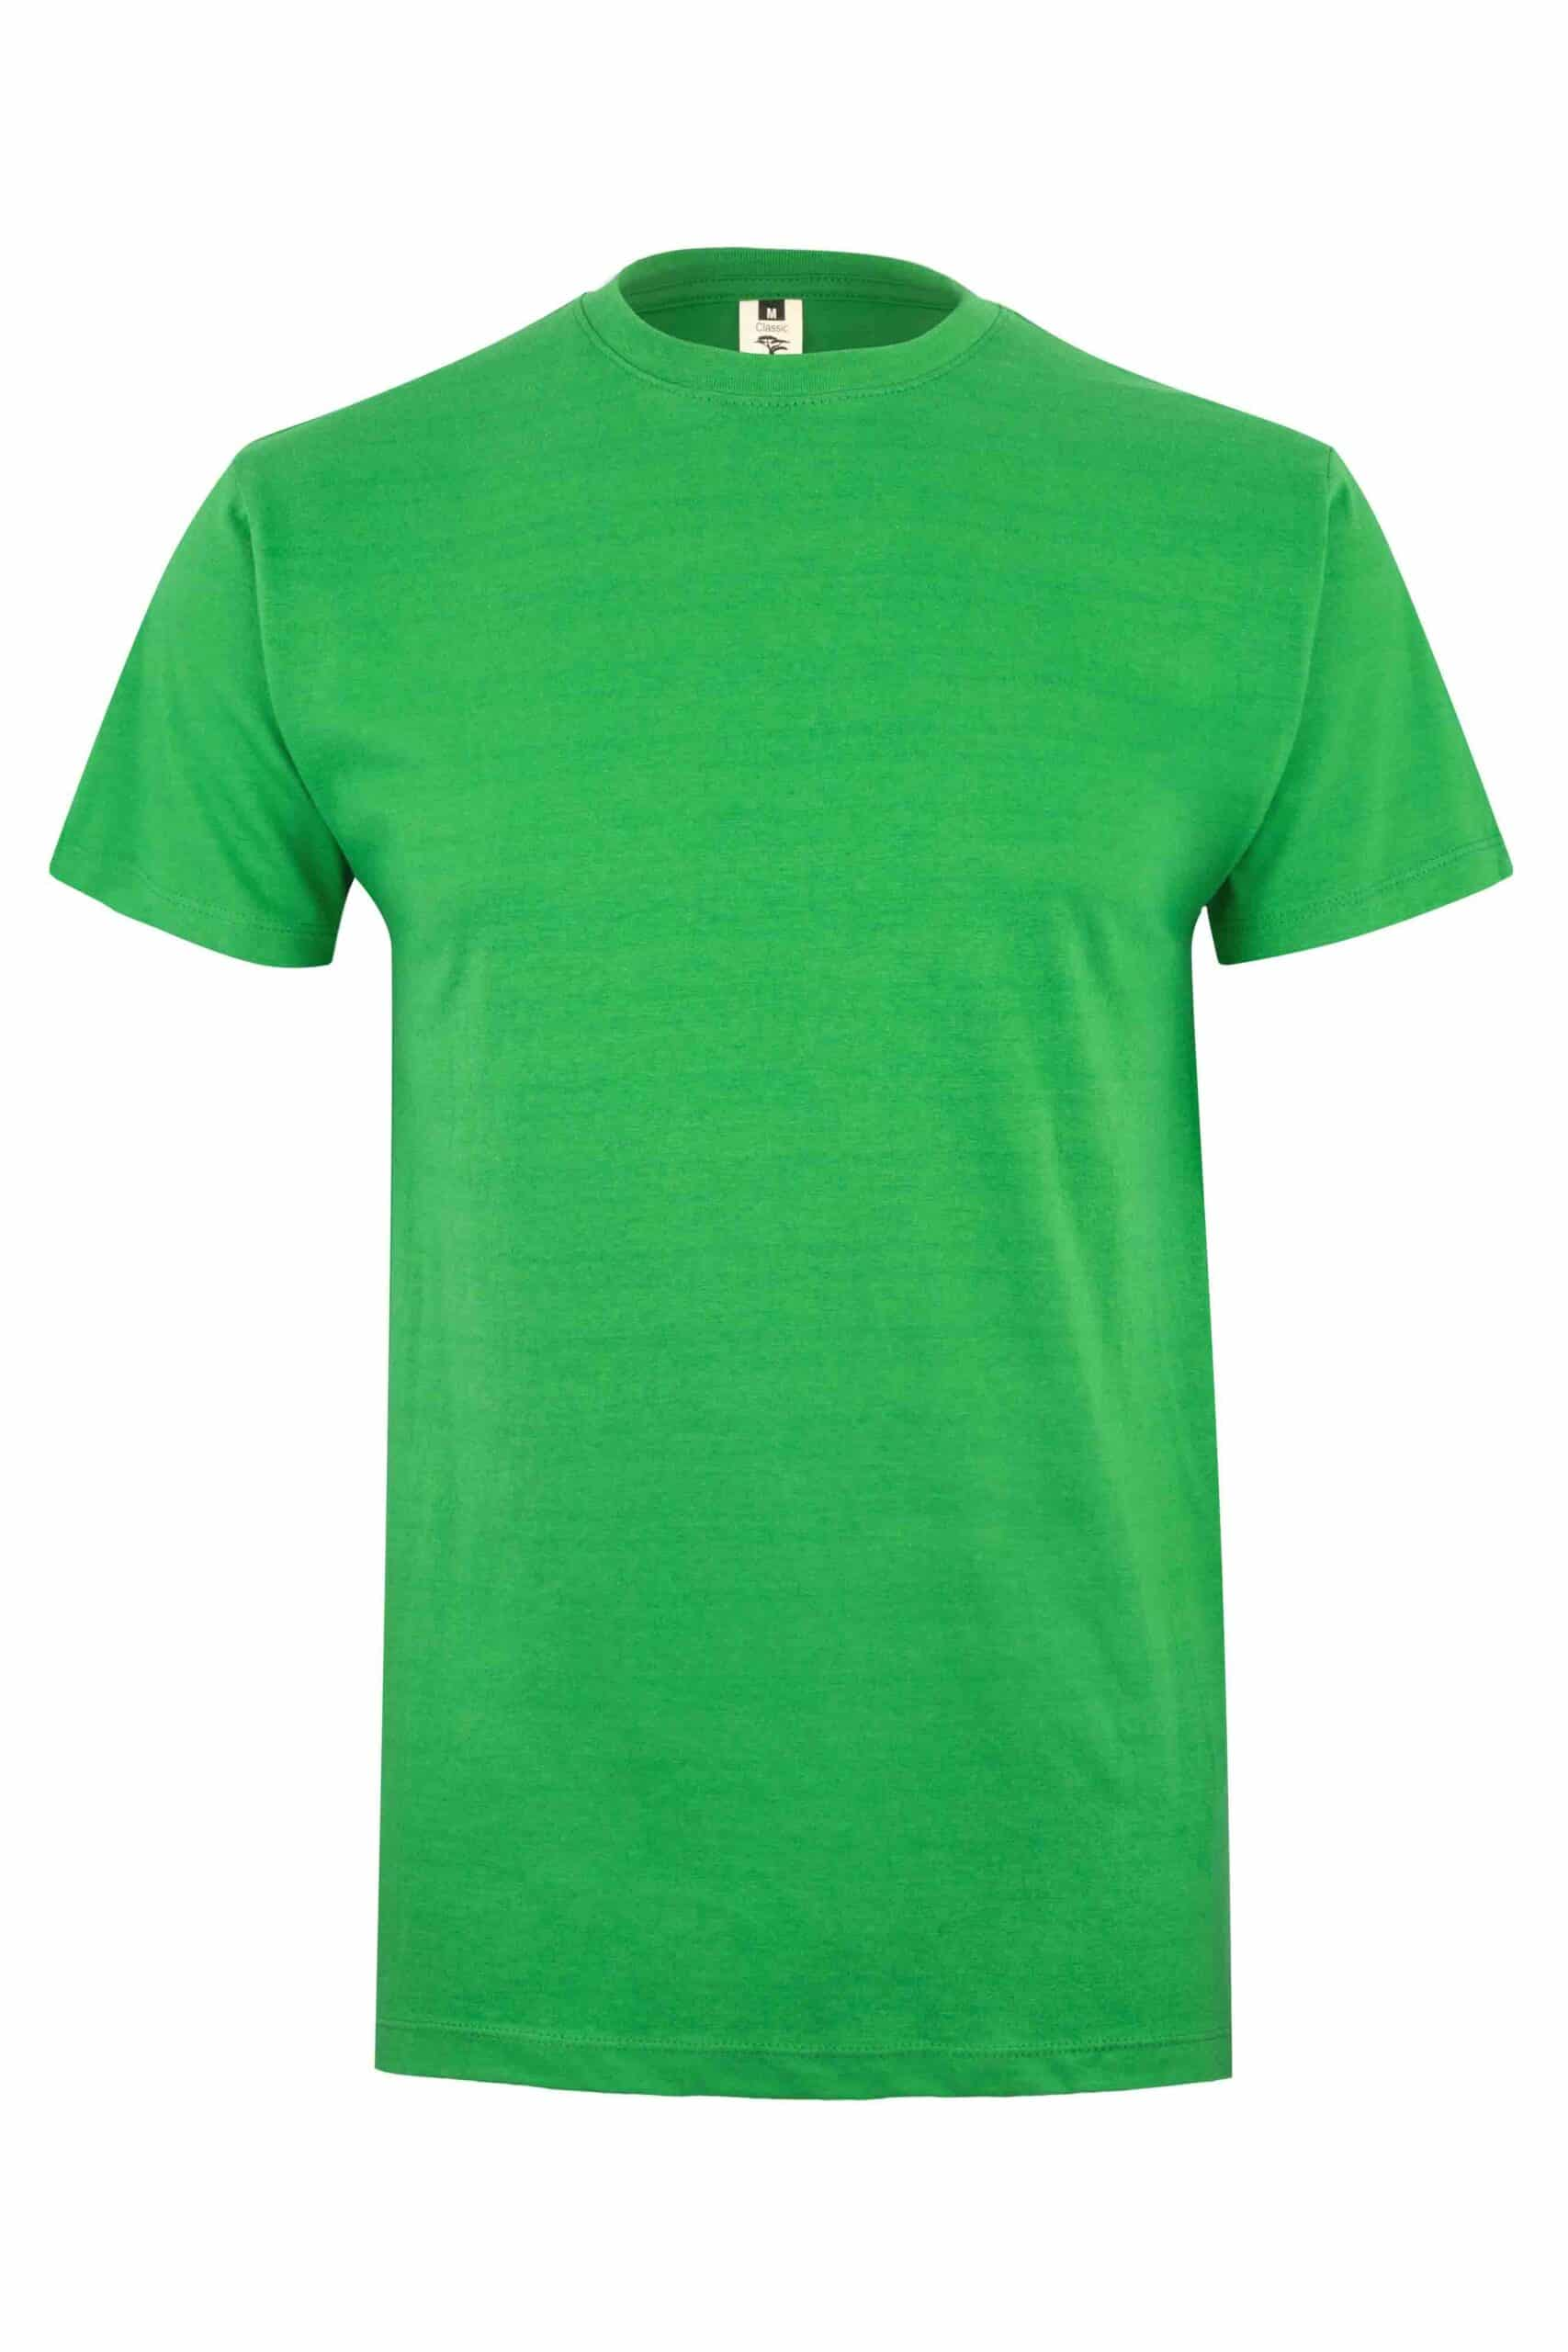 Mukua Mk022cv Camiseta Manga Corta 150gr Real Green